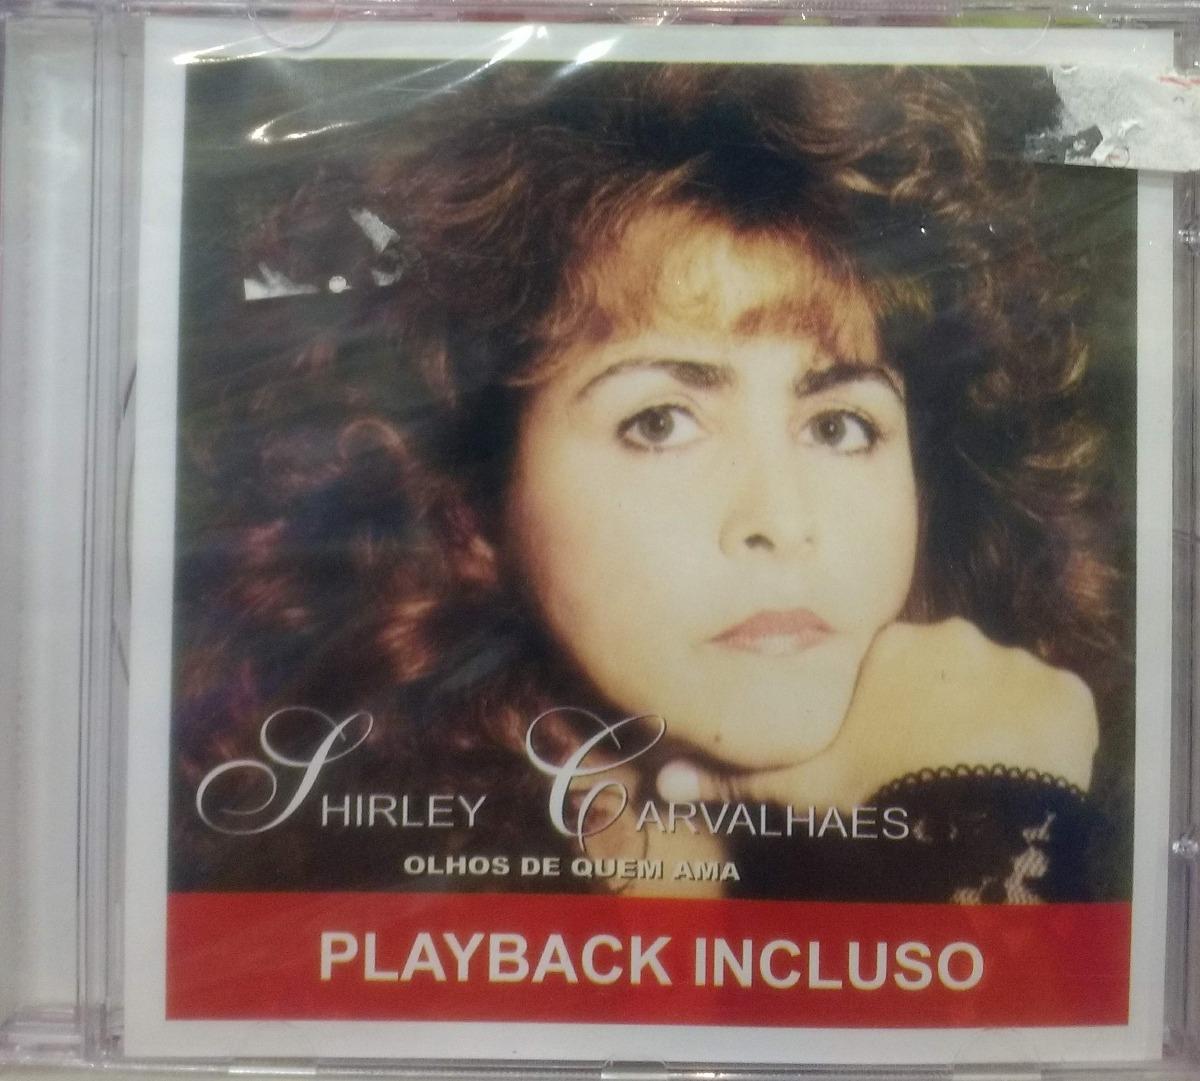 cd shirley carvalhaes deus tremendo playback